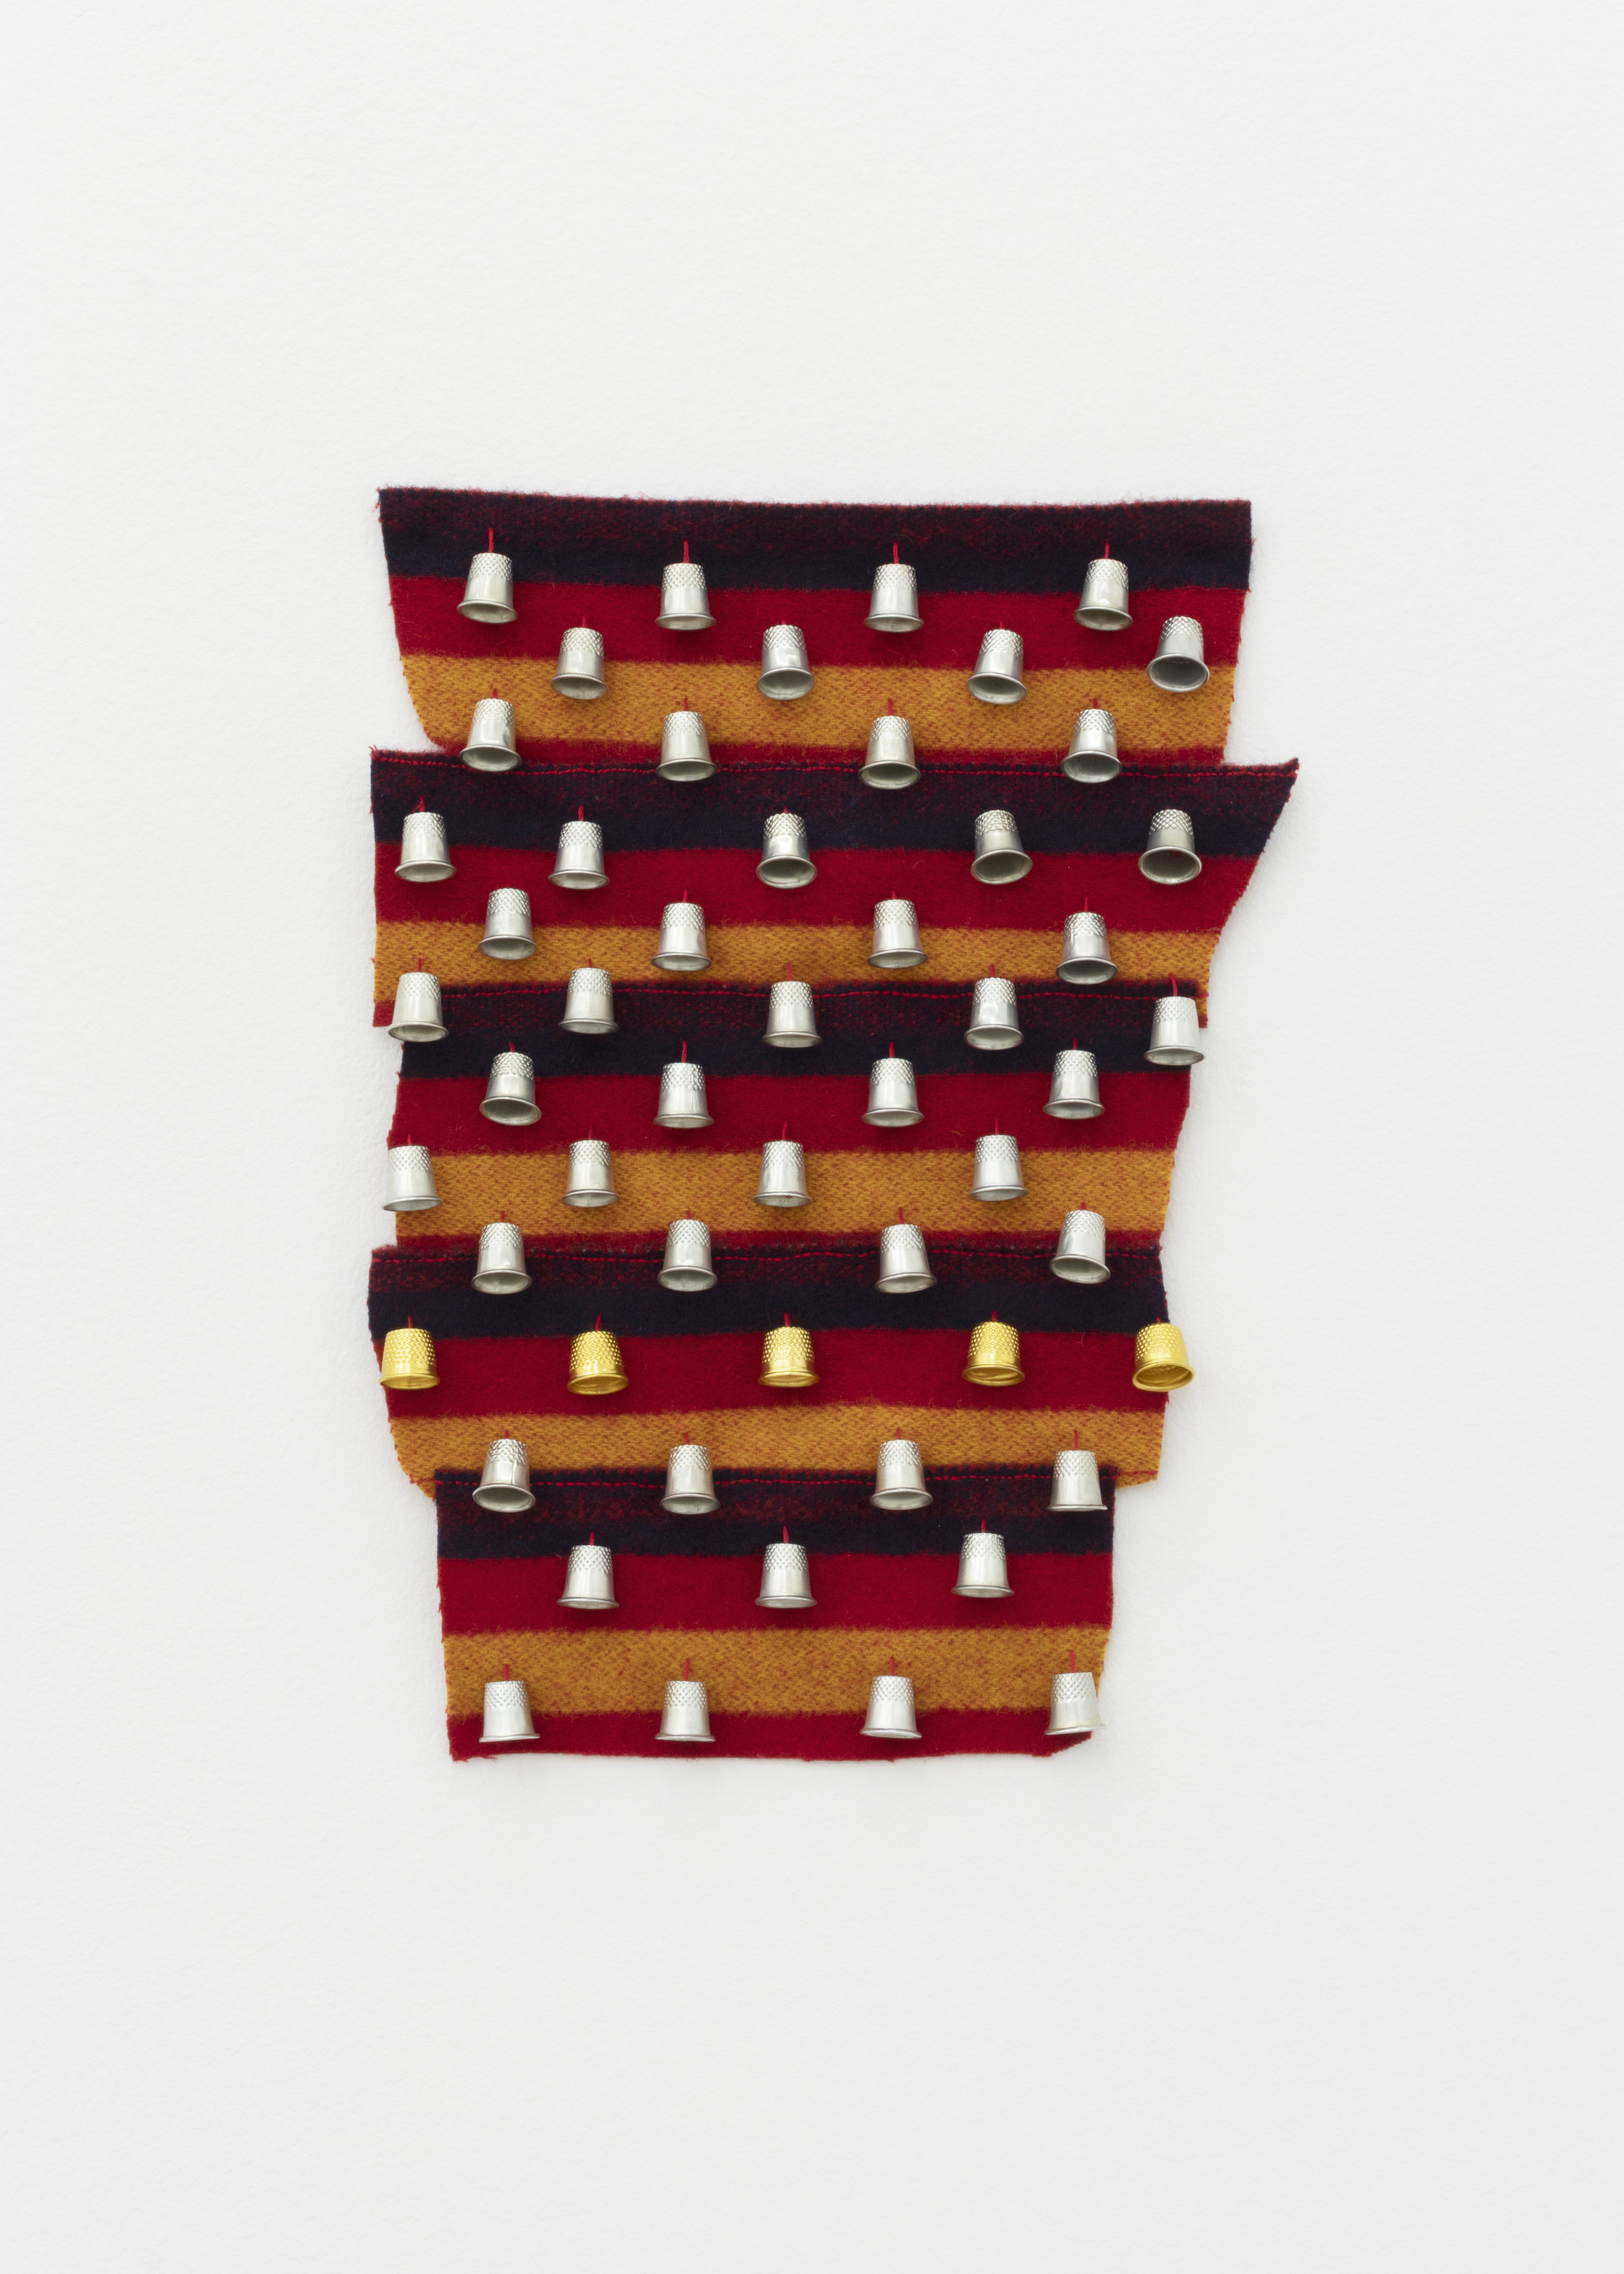 Thimblez , 2019, thimbles, thread, wool blanket scraps, 15 x 12 in.